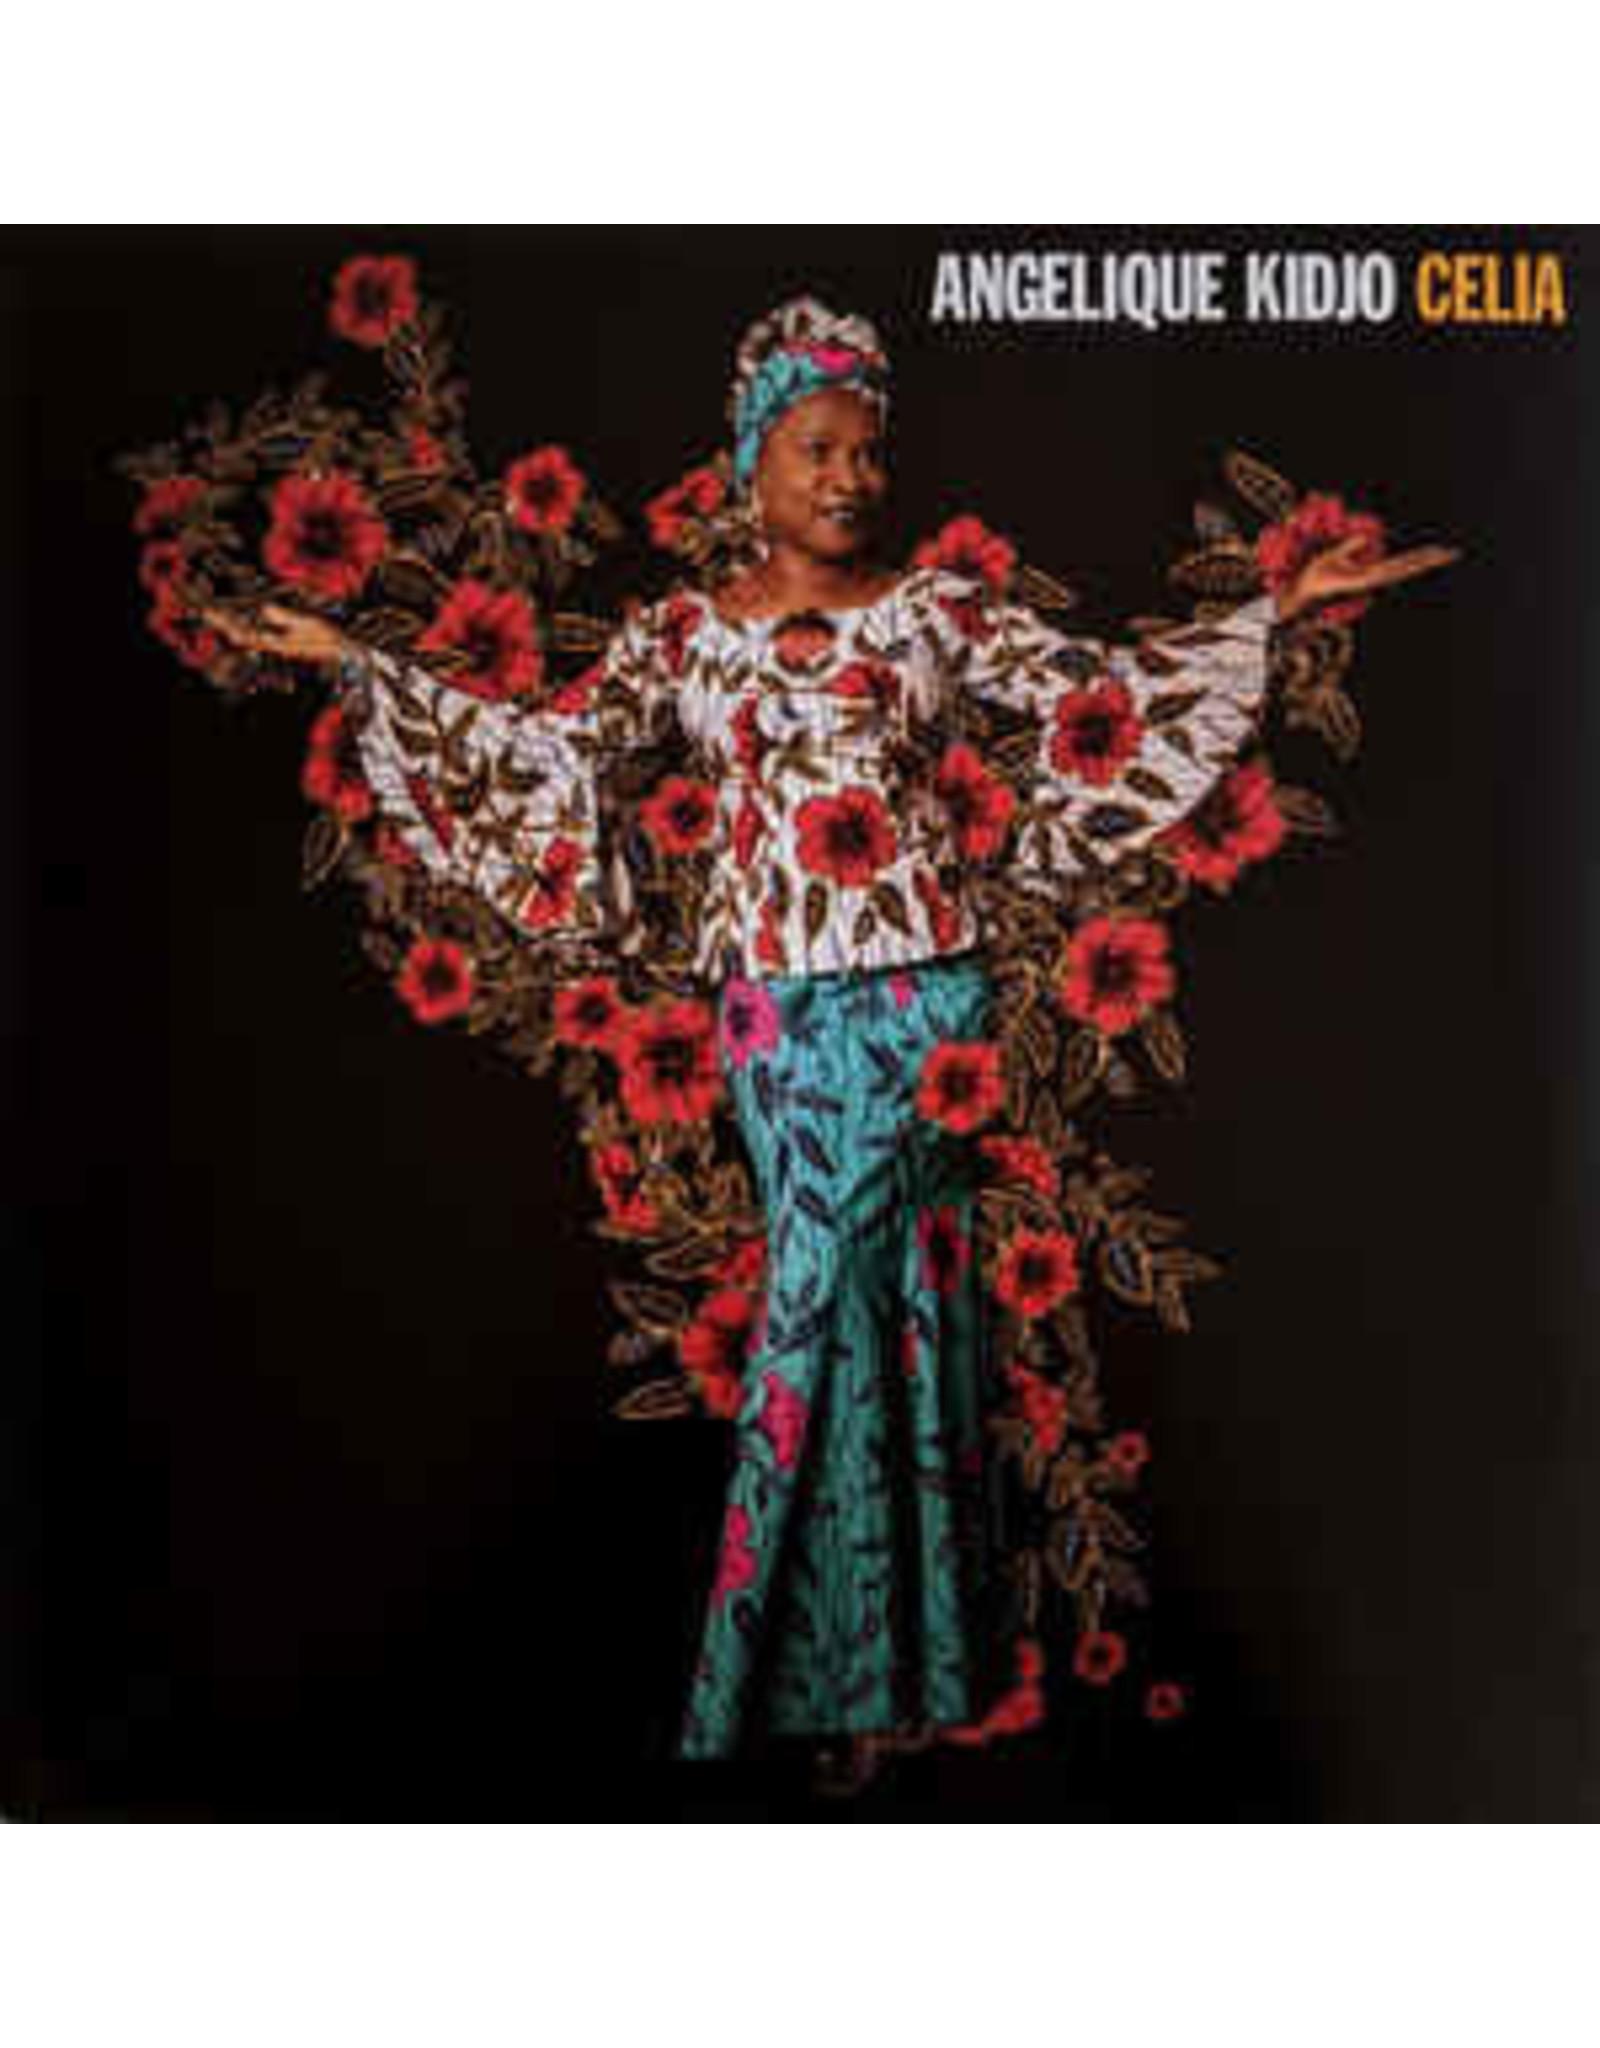 Angélique Kidjo / Celia